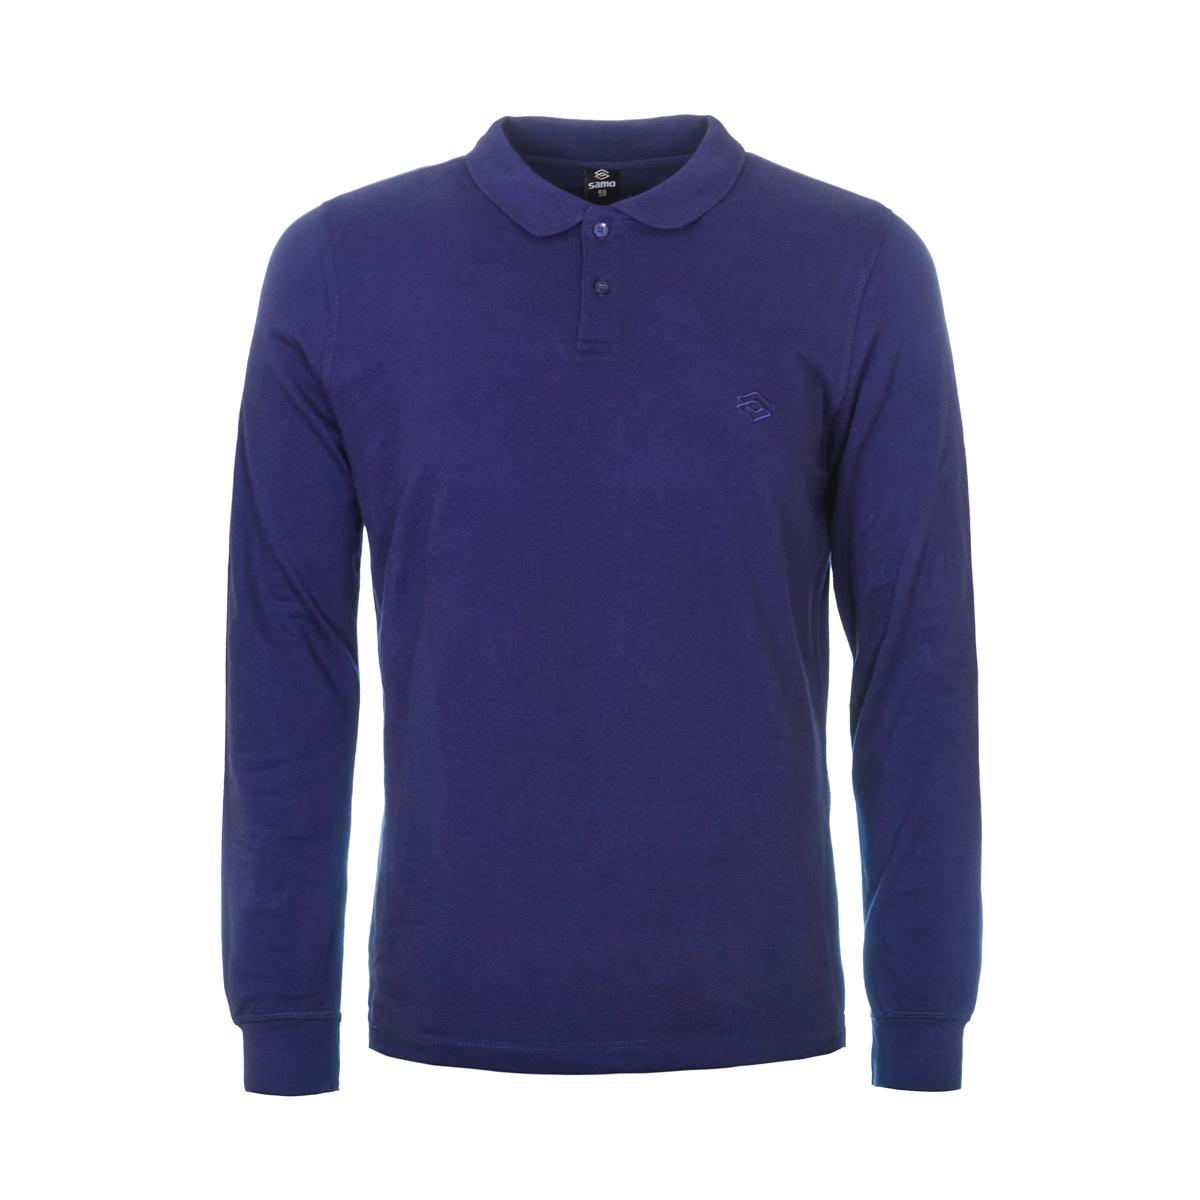 Муж. кофта арт. 04-0041 Темно-синий р. 46 - Мужская одежда артикул: 25653